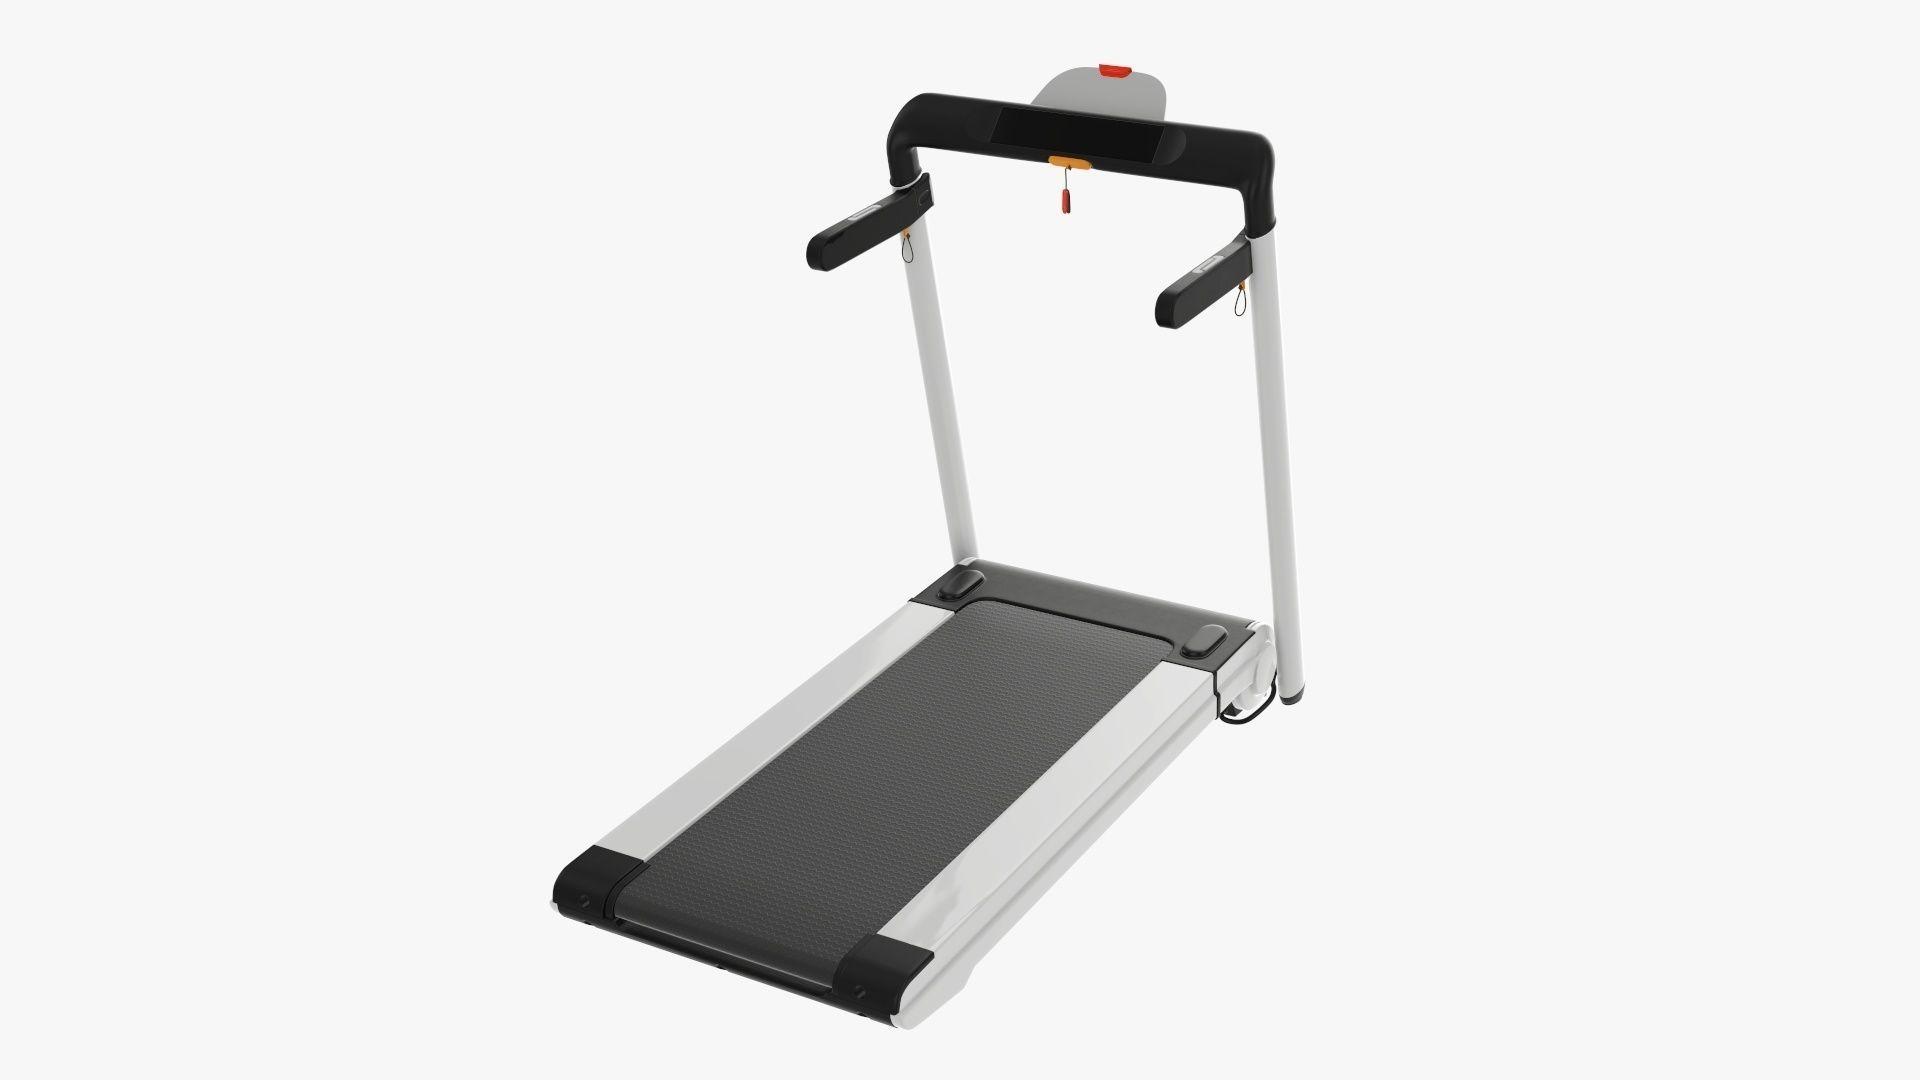 Compact treadmill foldable